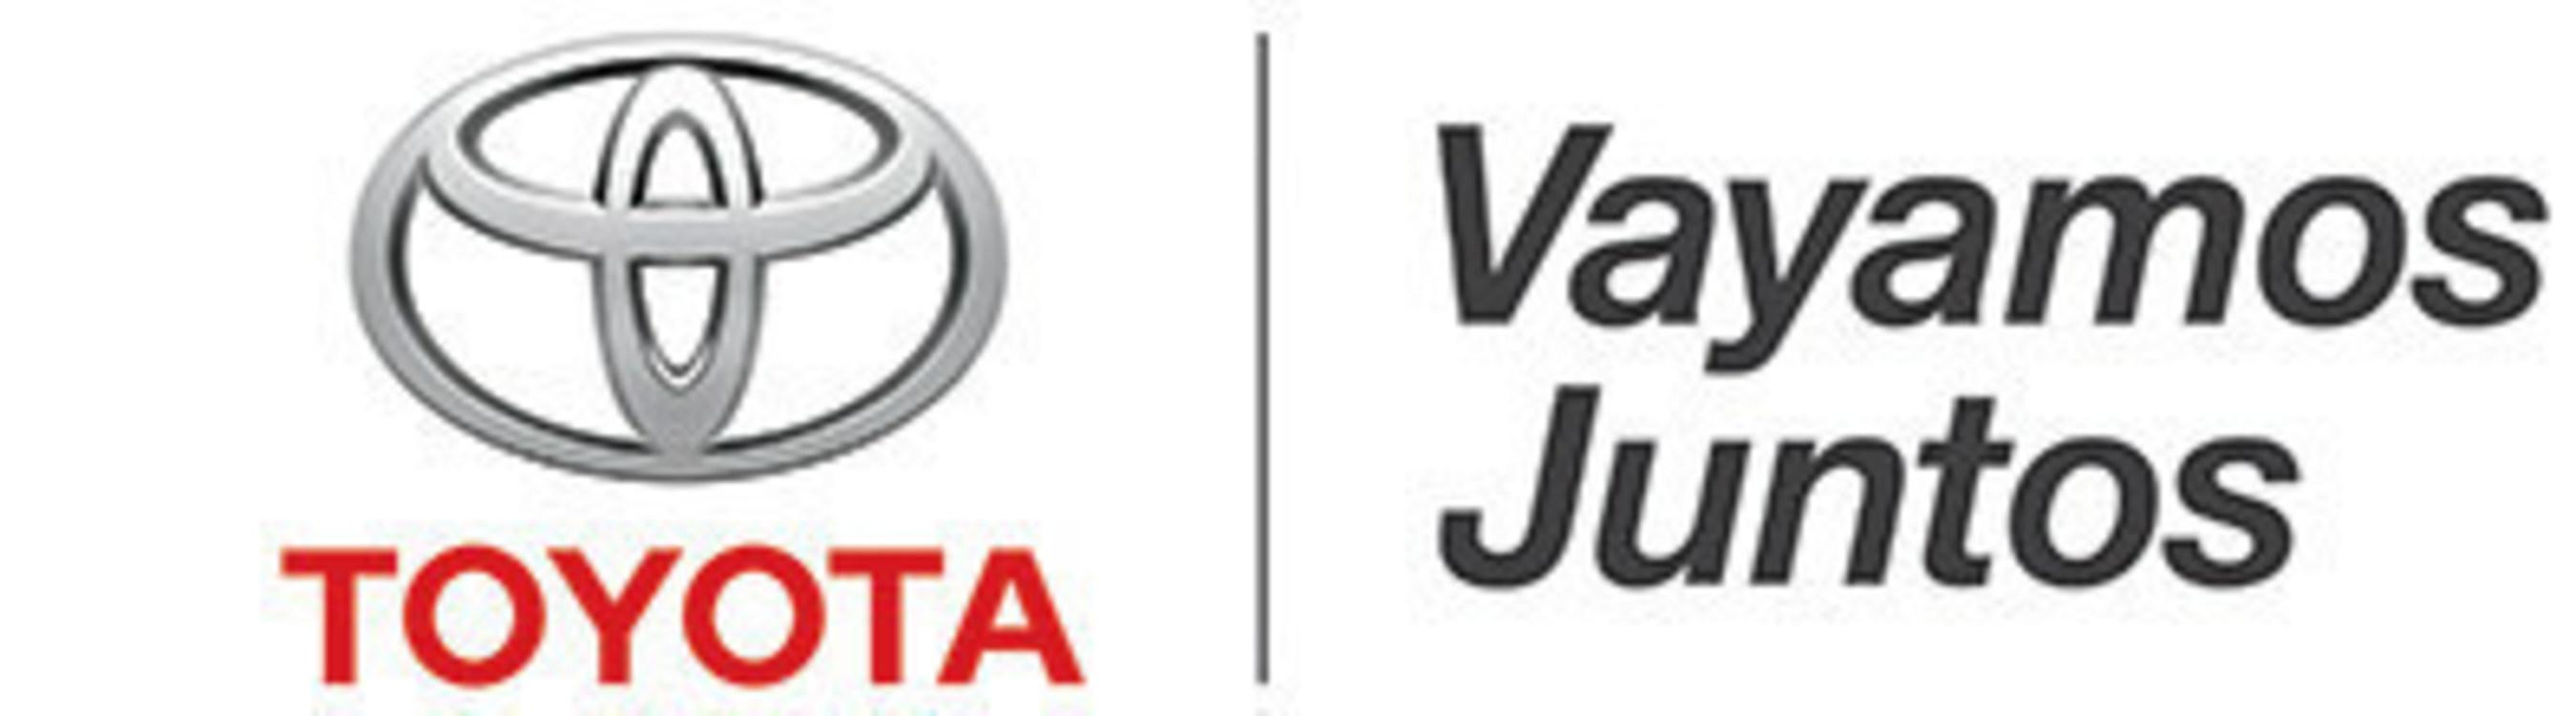 Toyota Vayamos Juntos logo